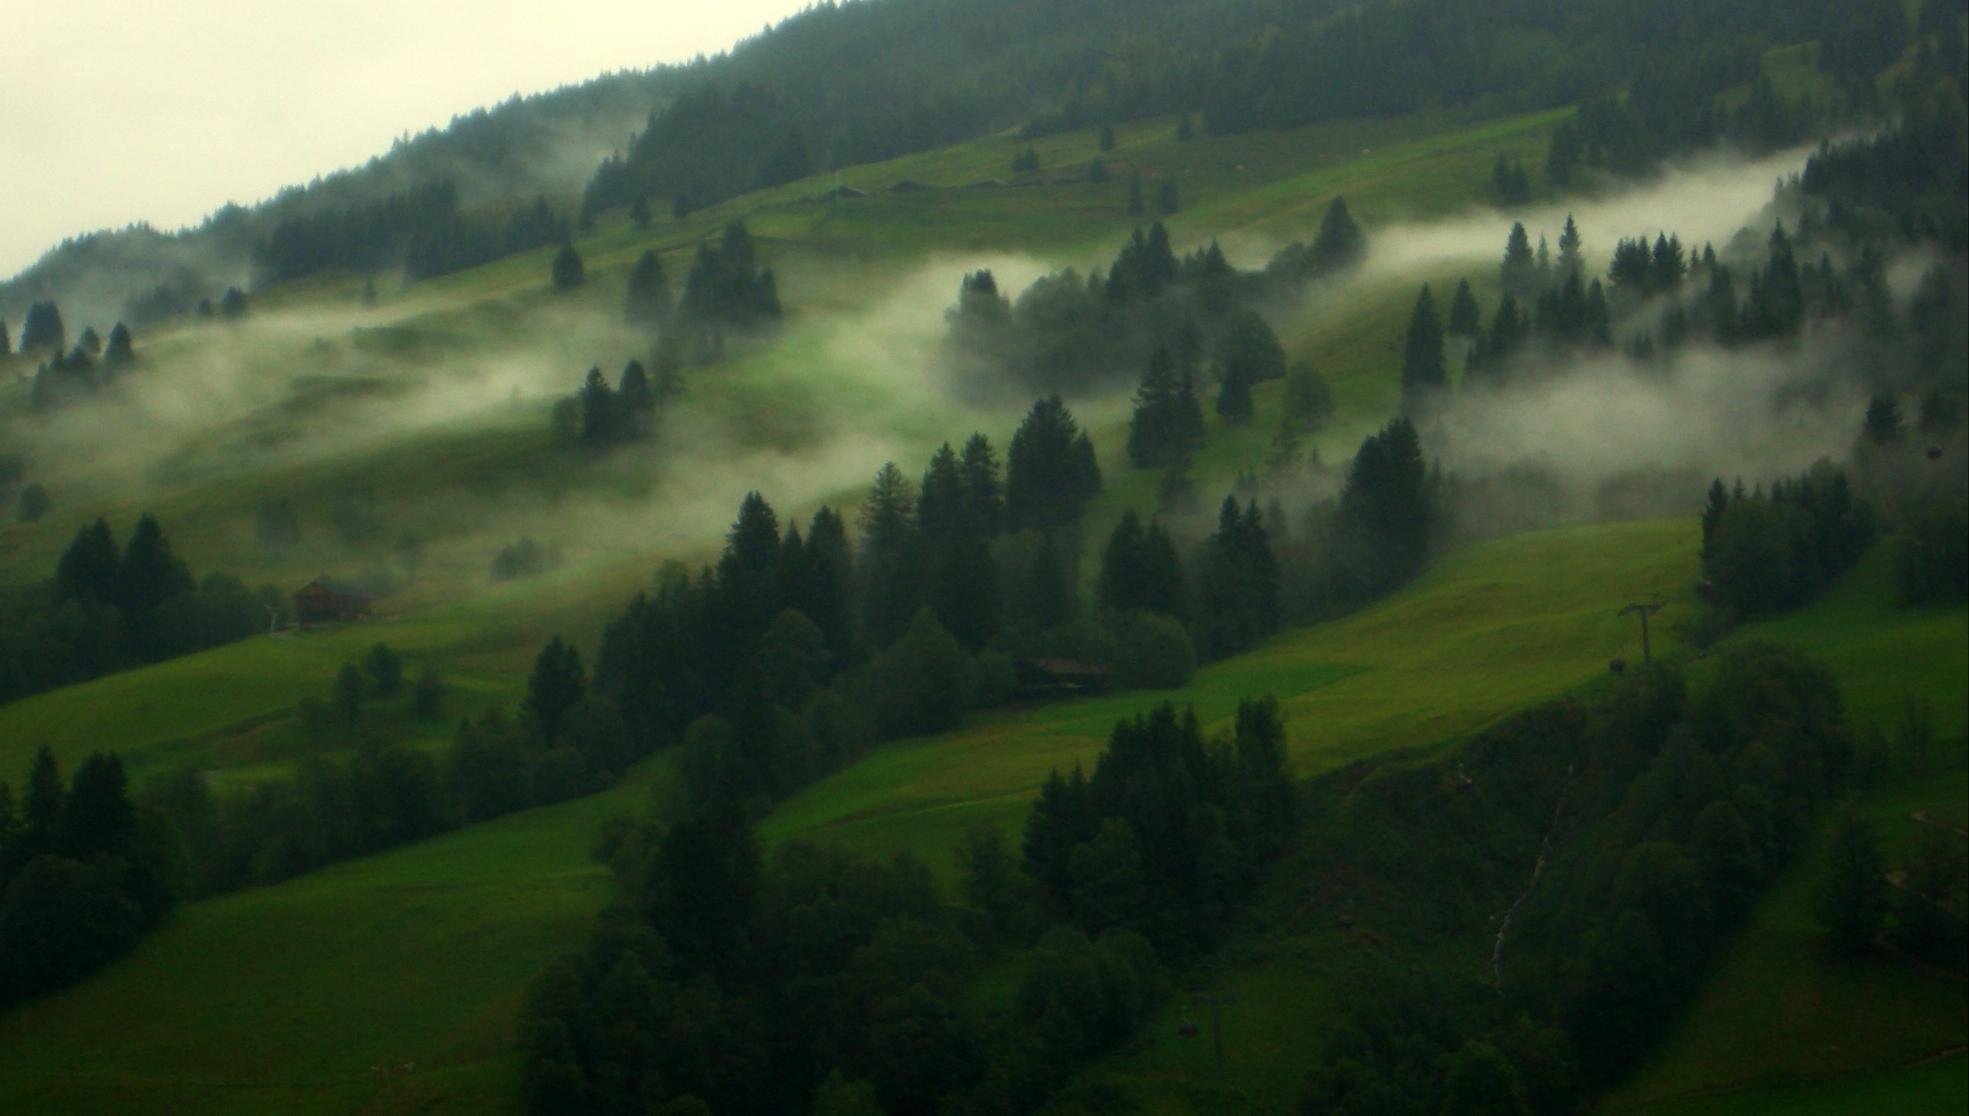 misty mountain by Mittelfranke